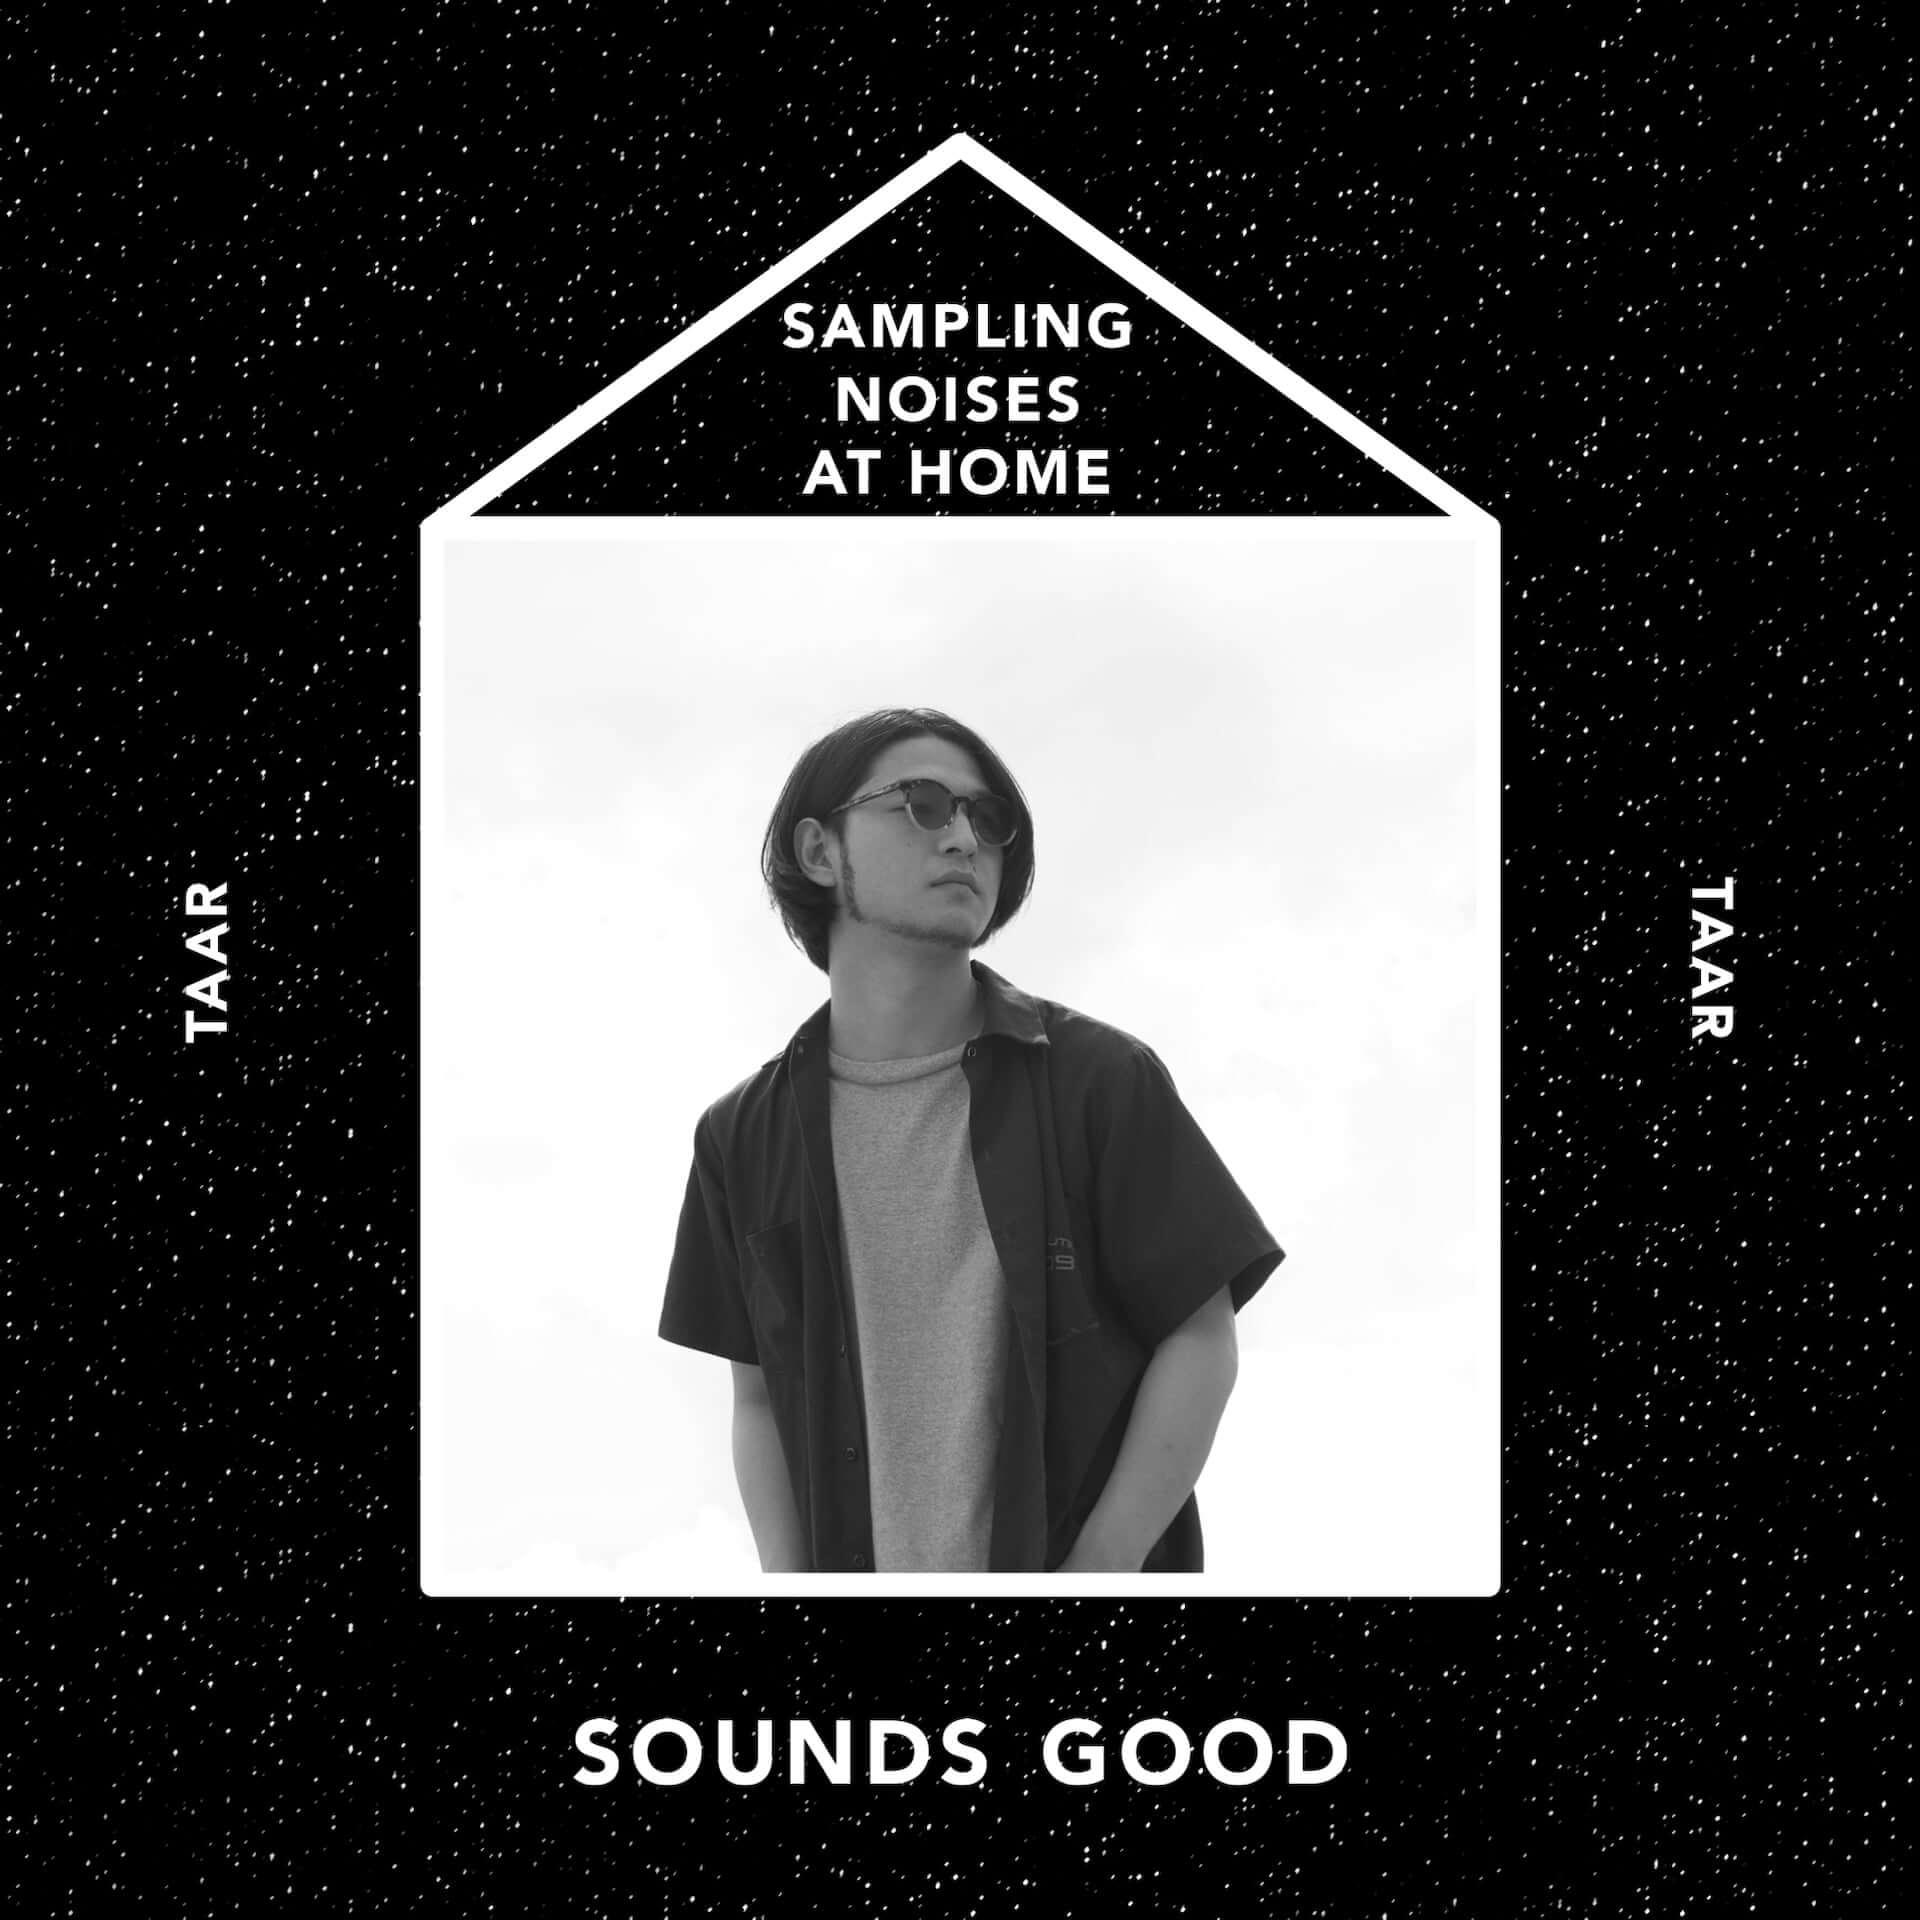 SOUNDS GOOD®とblock.fmによるコンピアルバムがリリース|80KIDZ、TAAR、Shin Sakiuraの楽曲が収録 music200603_feelsoundsgood_5-1920x1920